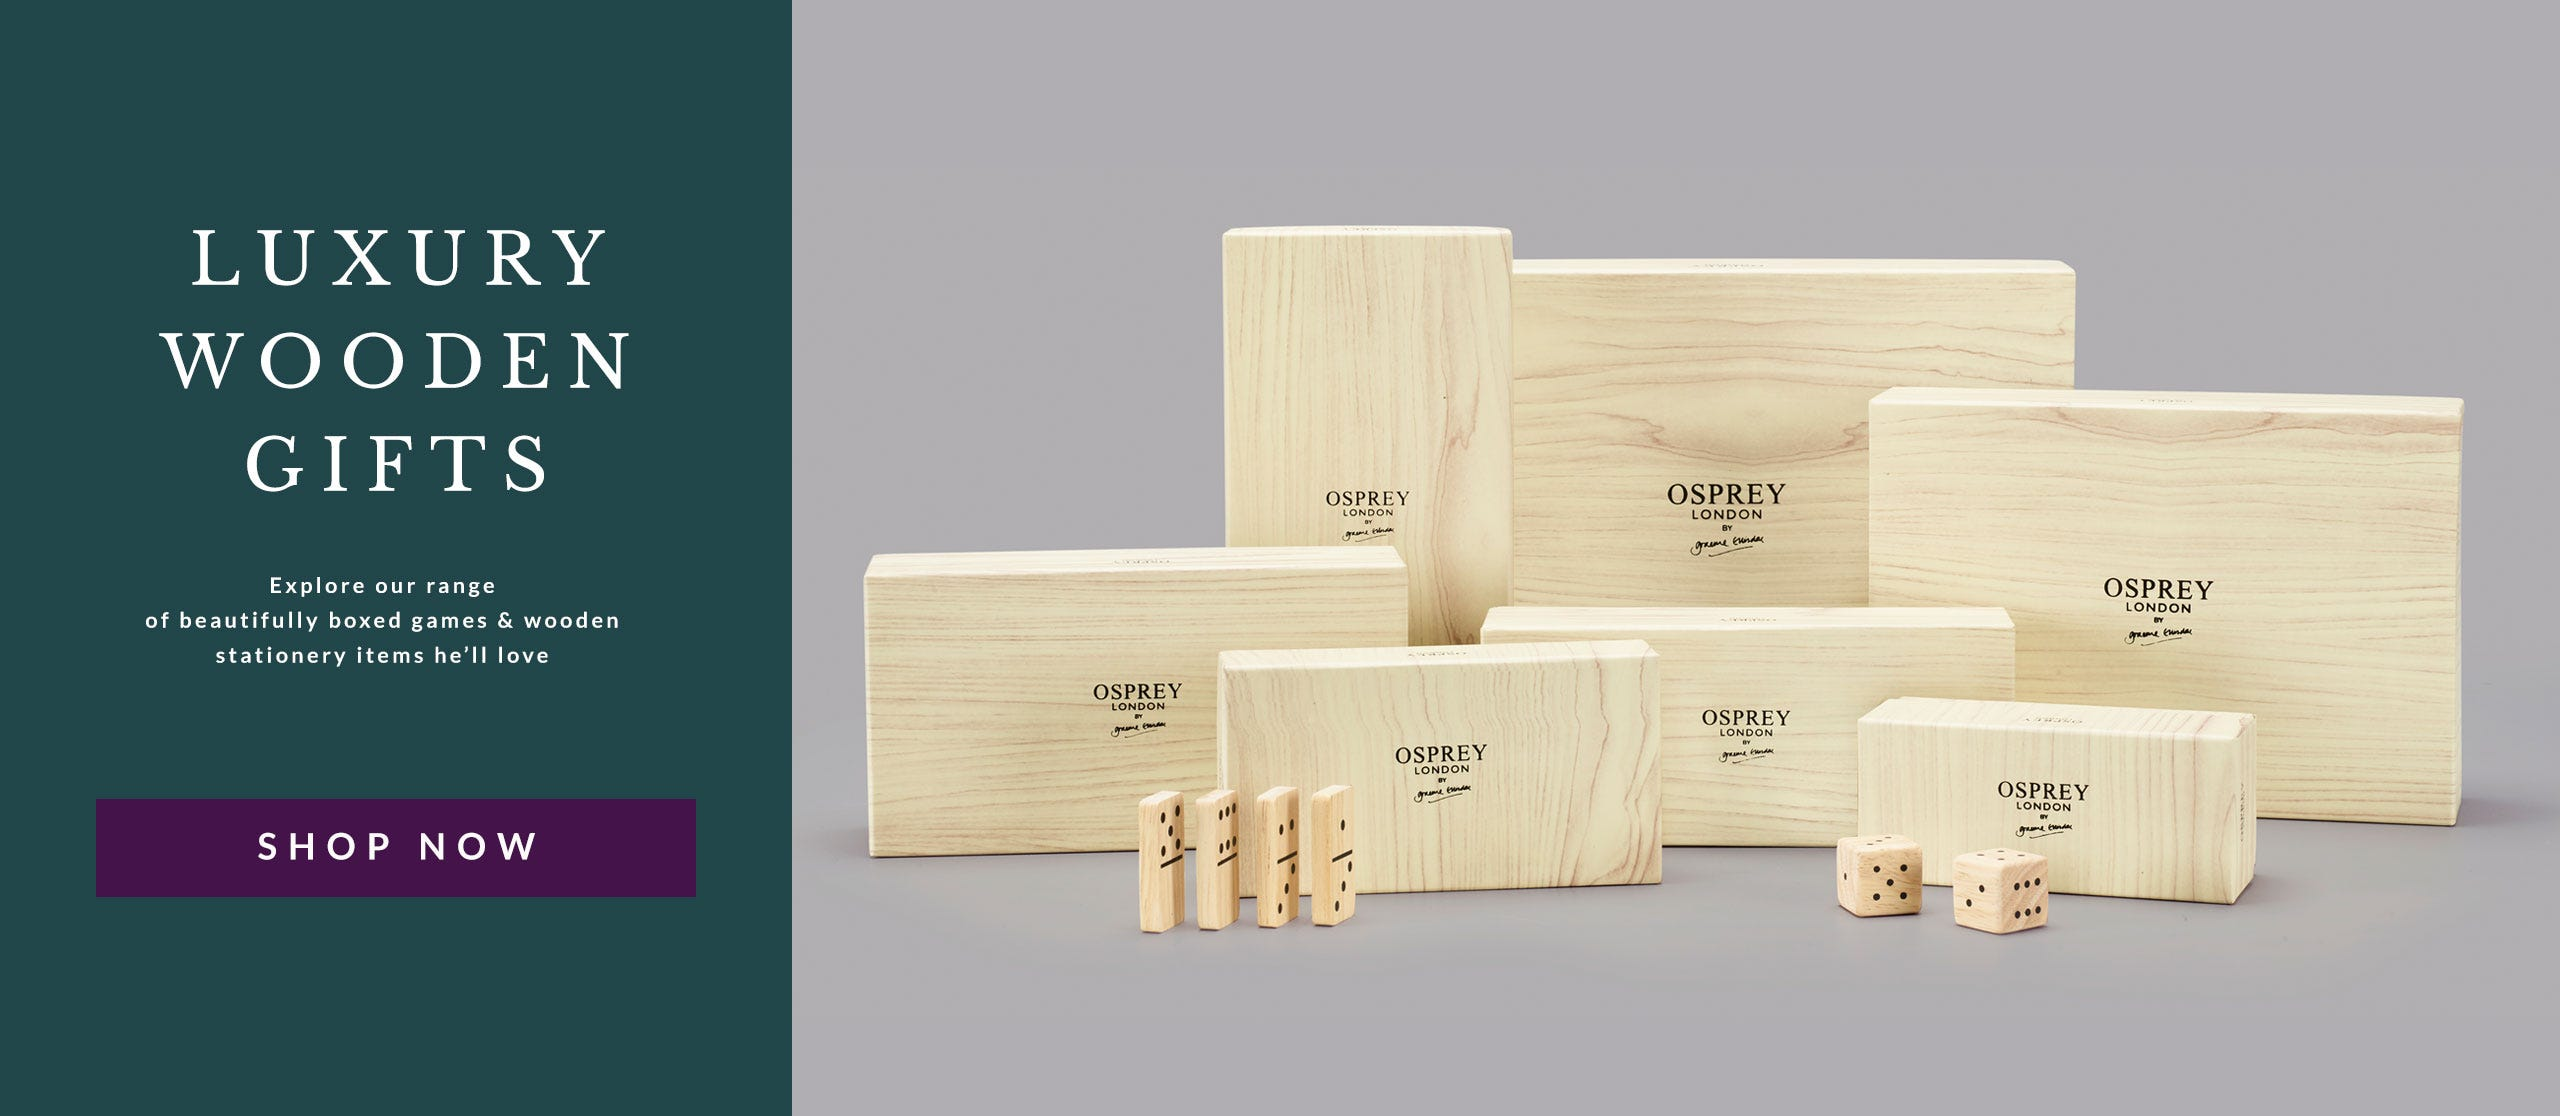 Explore OSPREY LONDON luxury wooden gifts